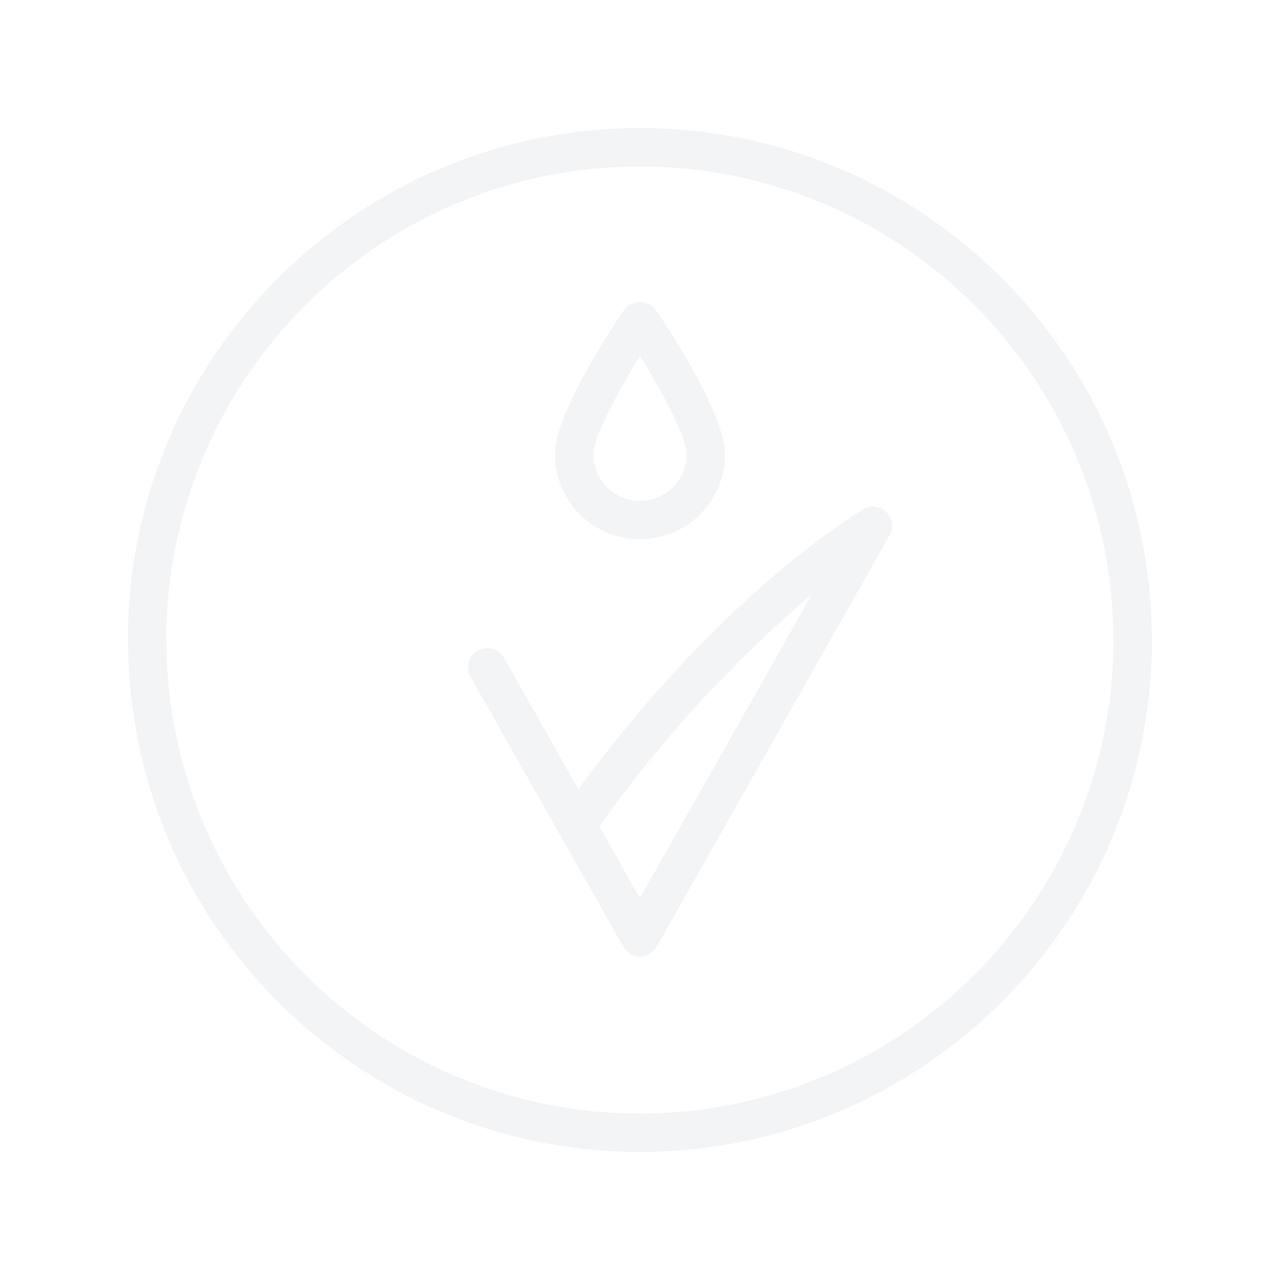 SAMPURE MINERALS Instant Glow Setting Powder 4.5g